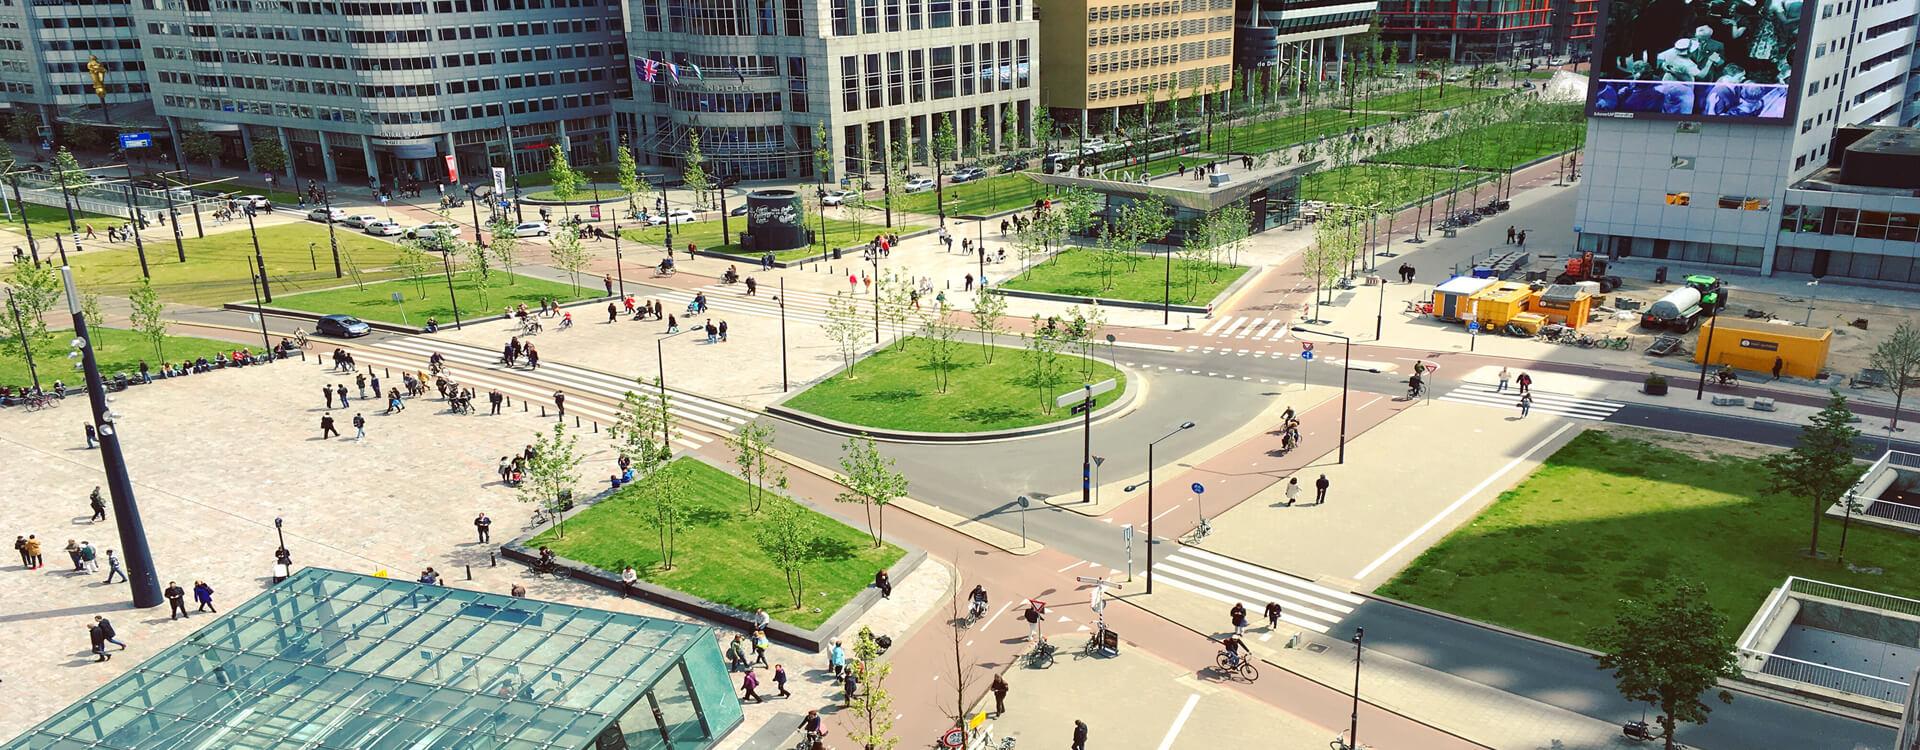 Smart Cities | Soluções digitais para Municípios - Civiq Dream by PARTTEAM & OEMKIOSKS